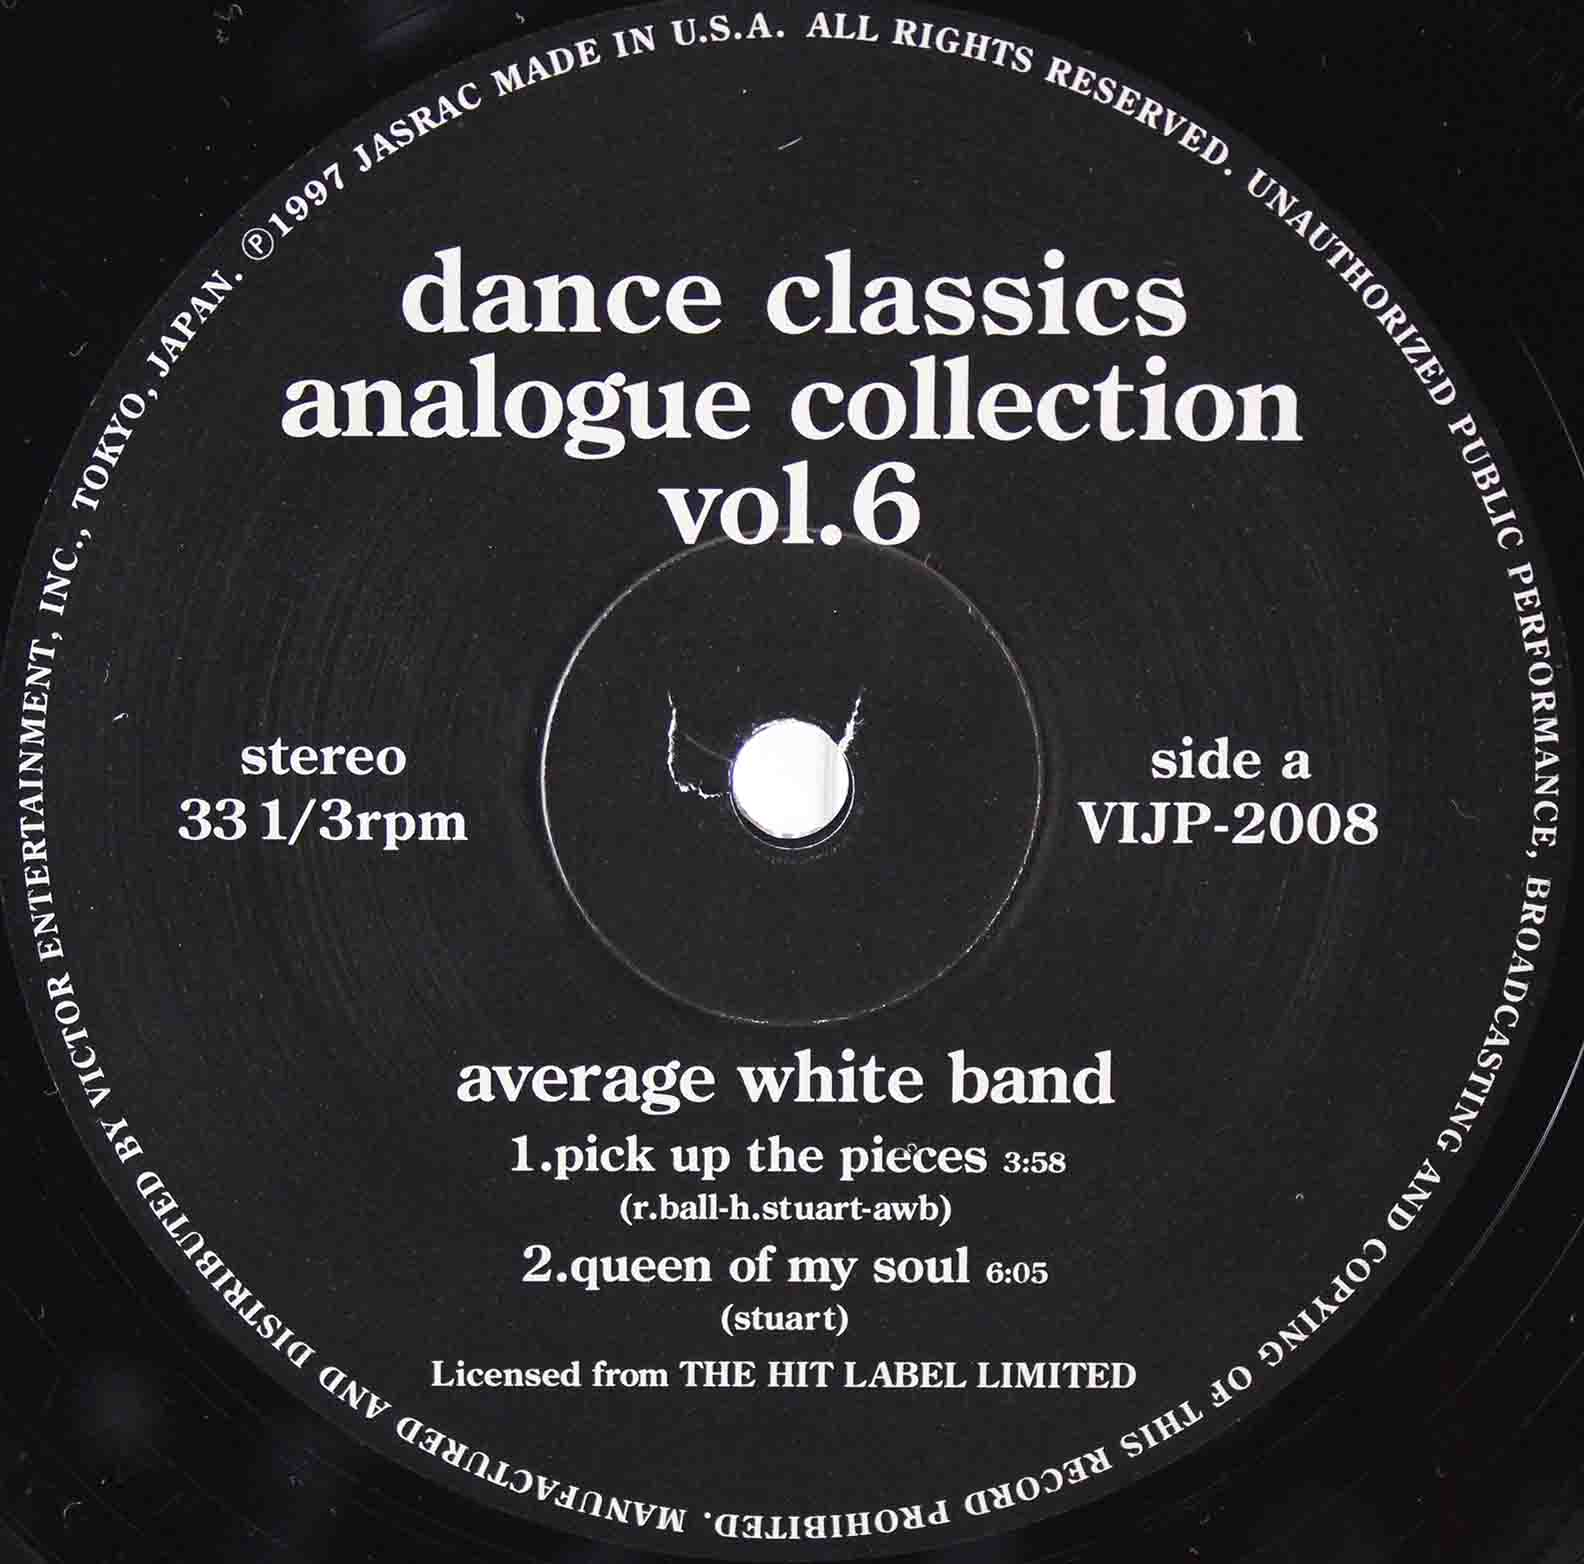 Average white band 12inch 02